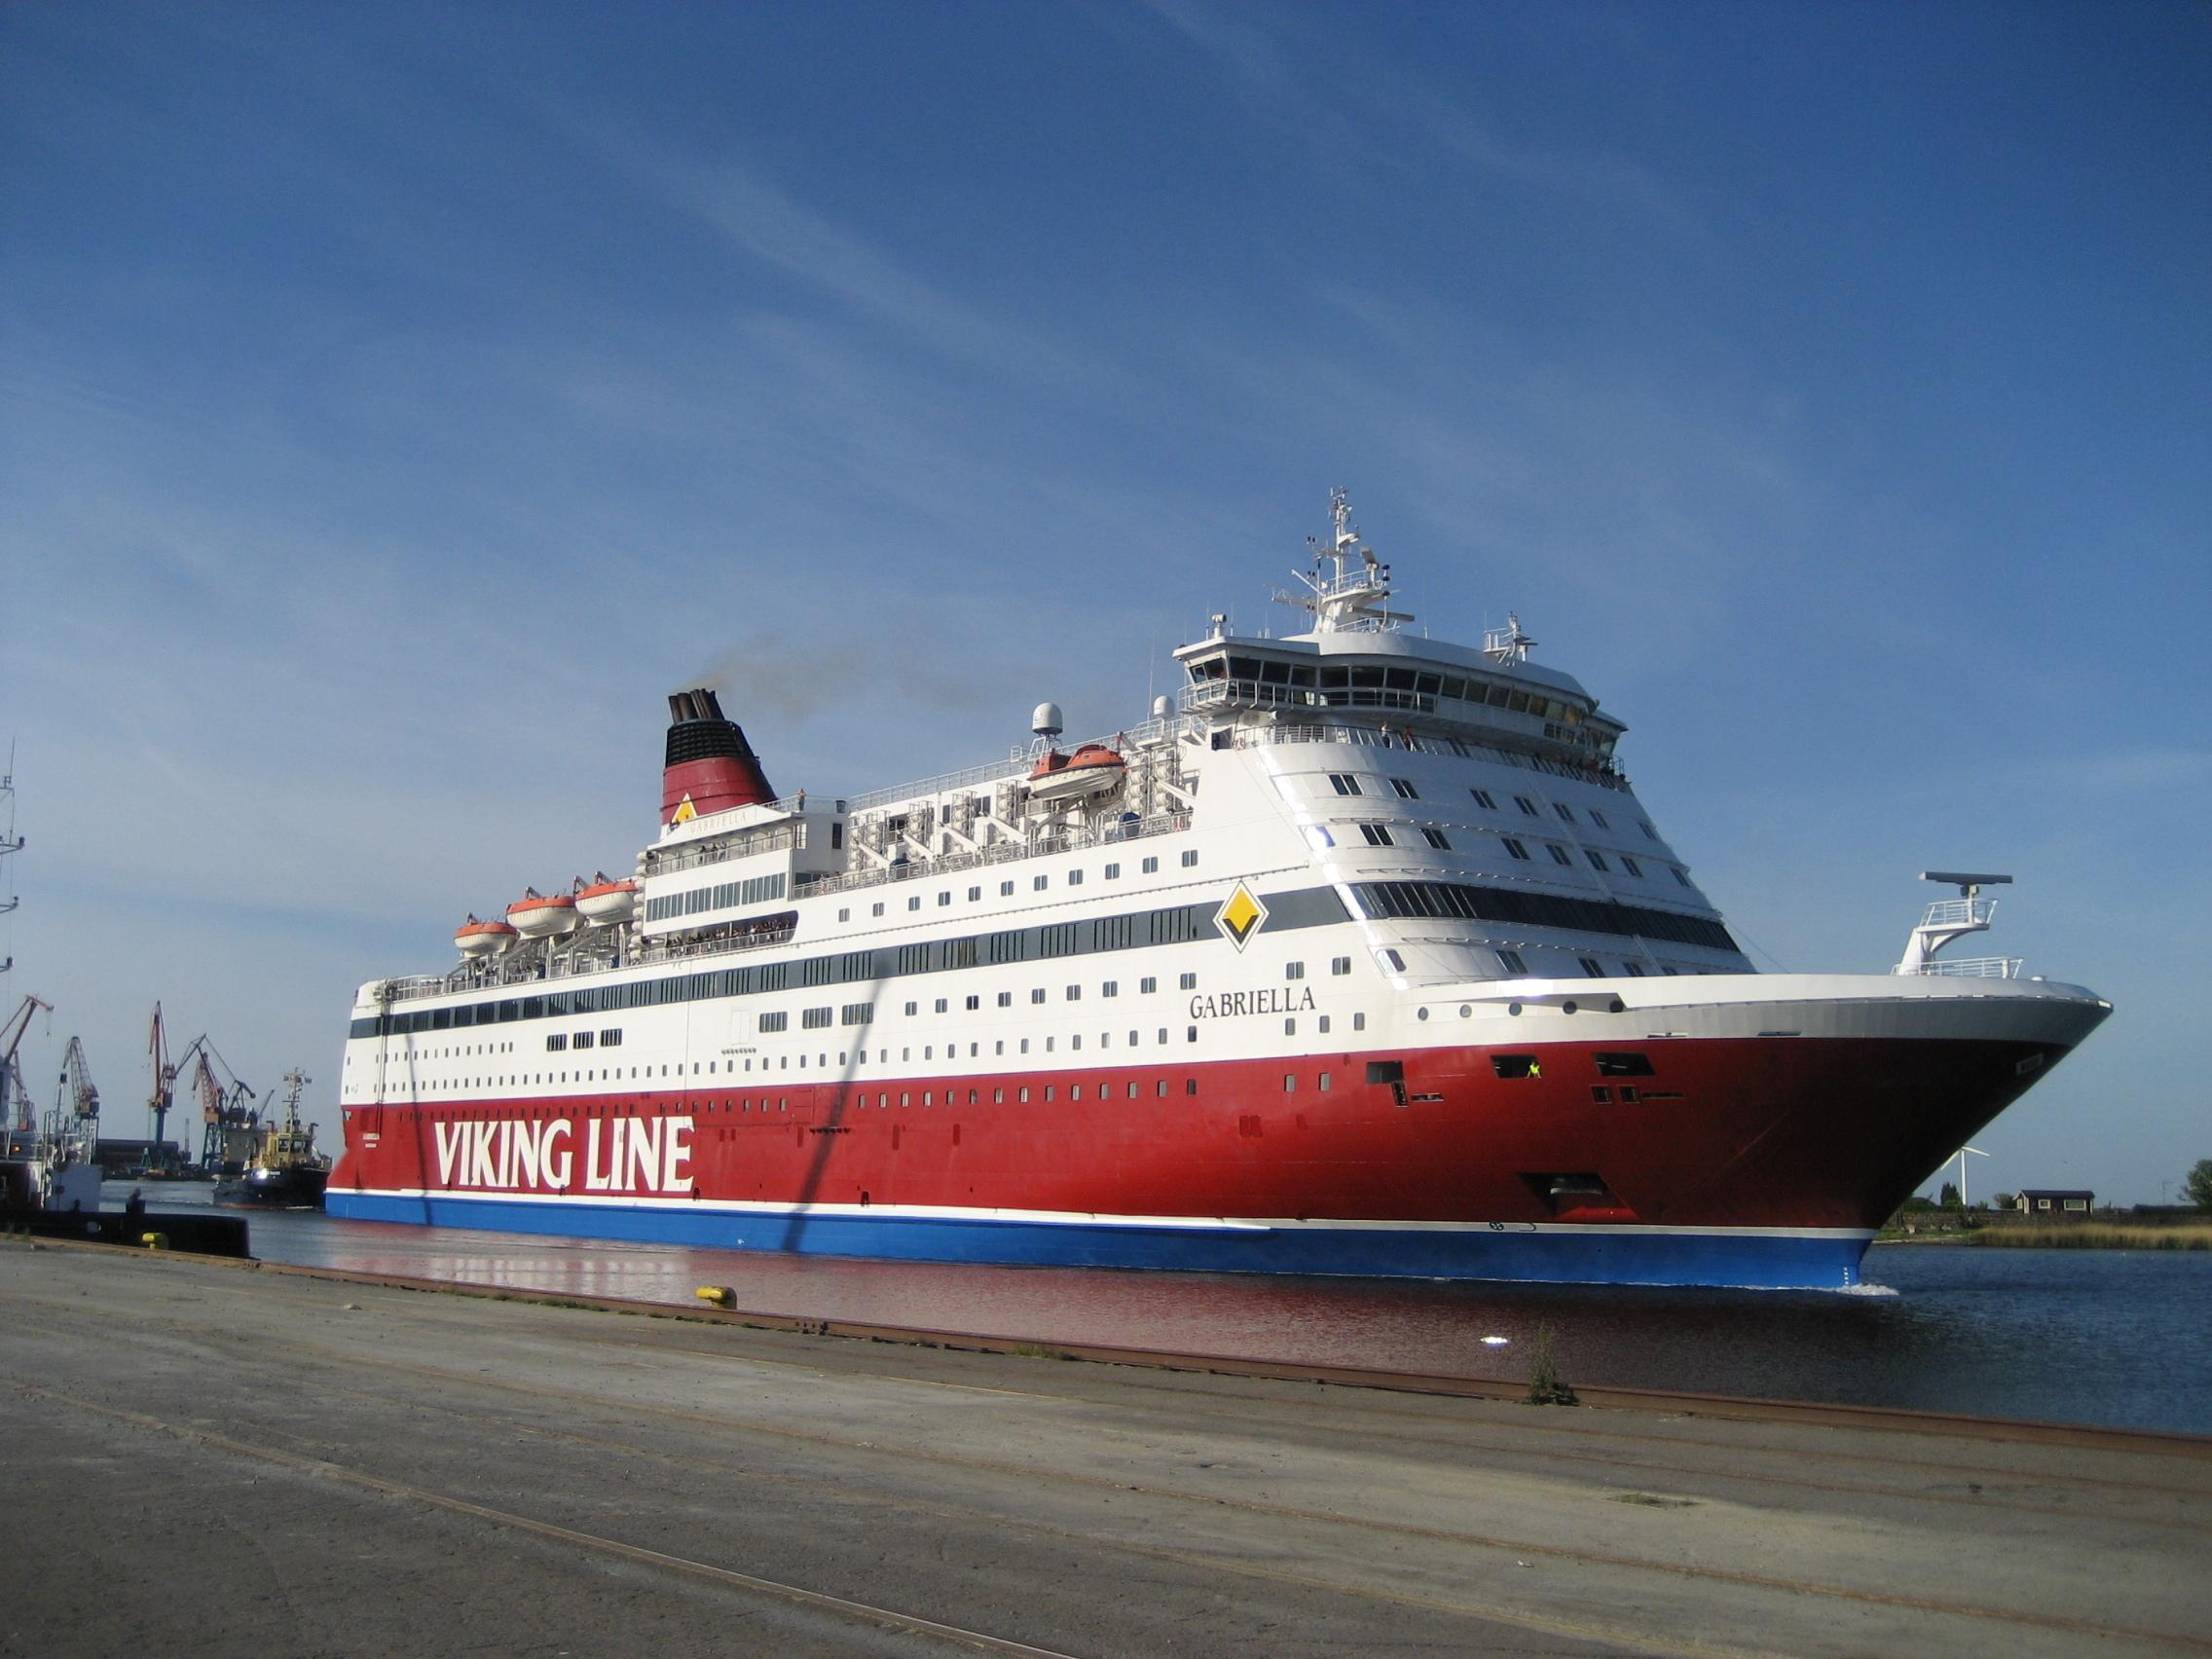 Cruise-Ferry-travel-1372874-2272-1704.jpg